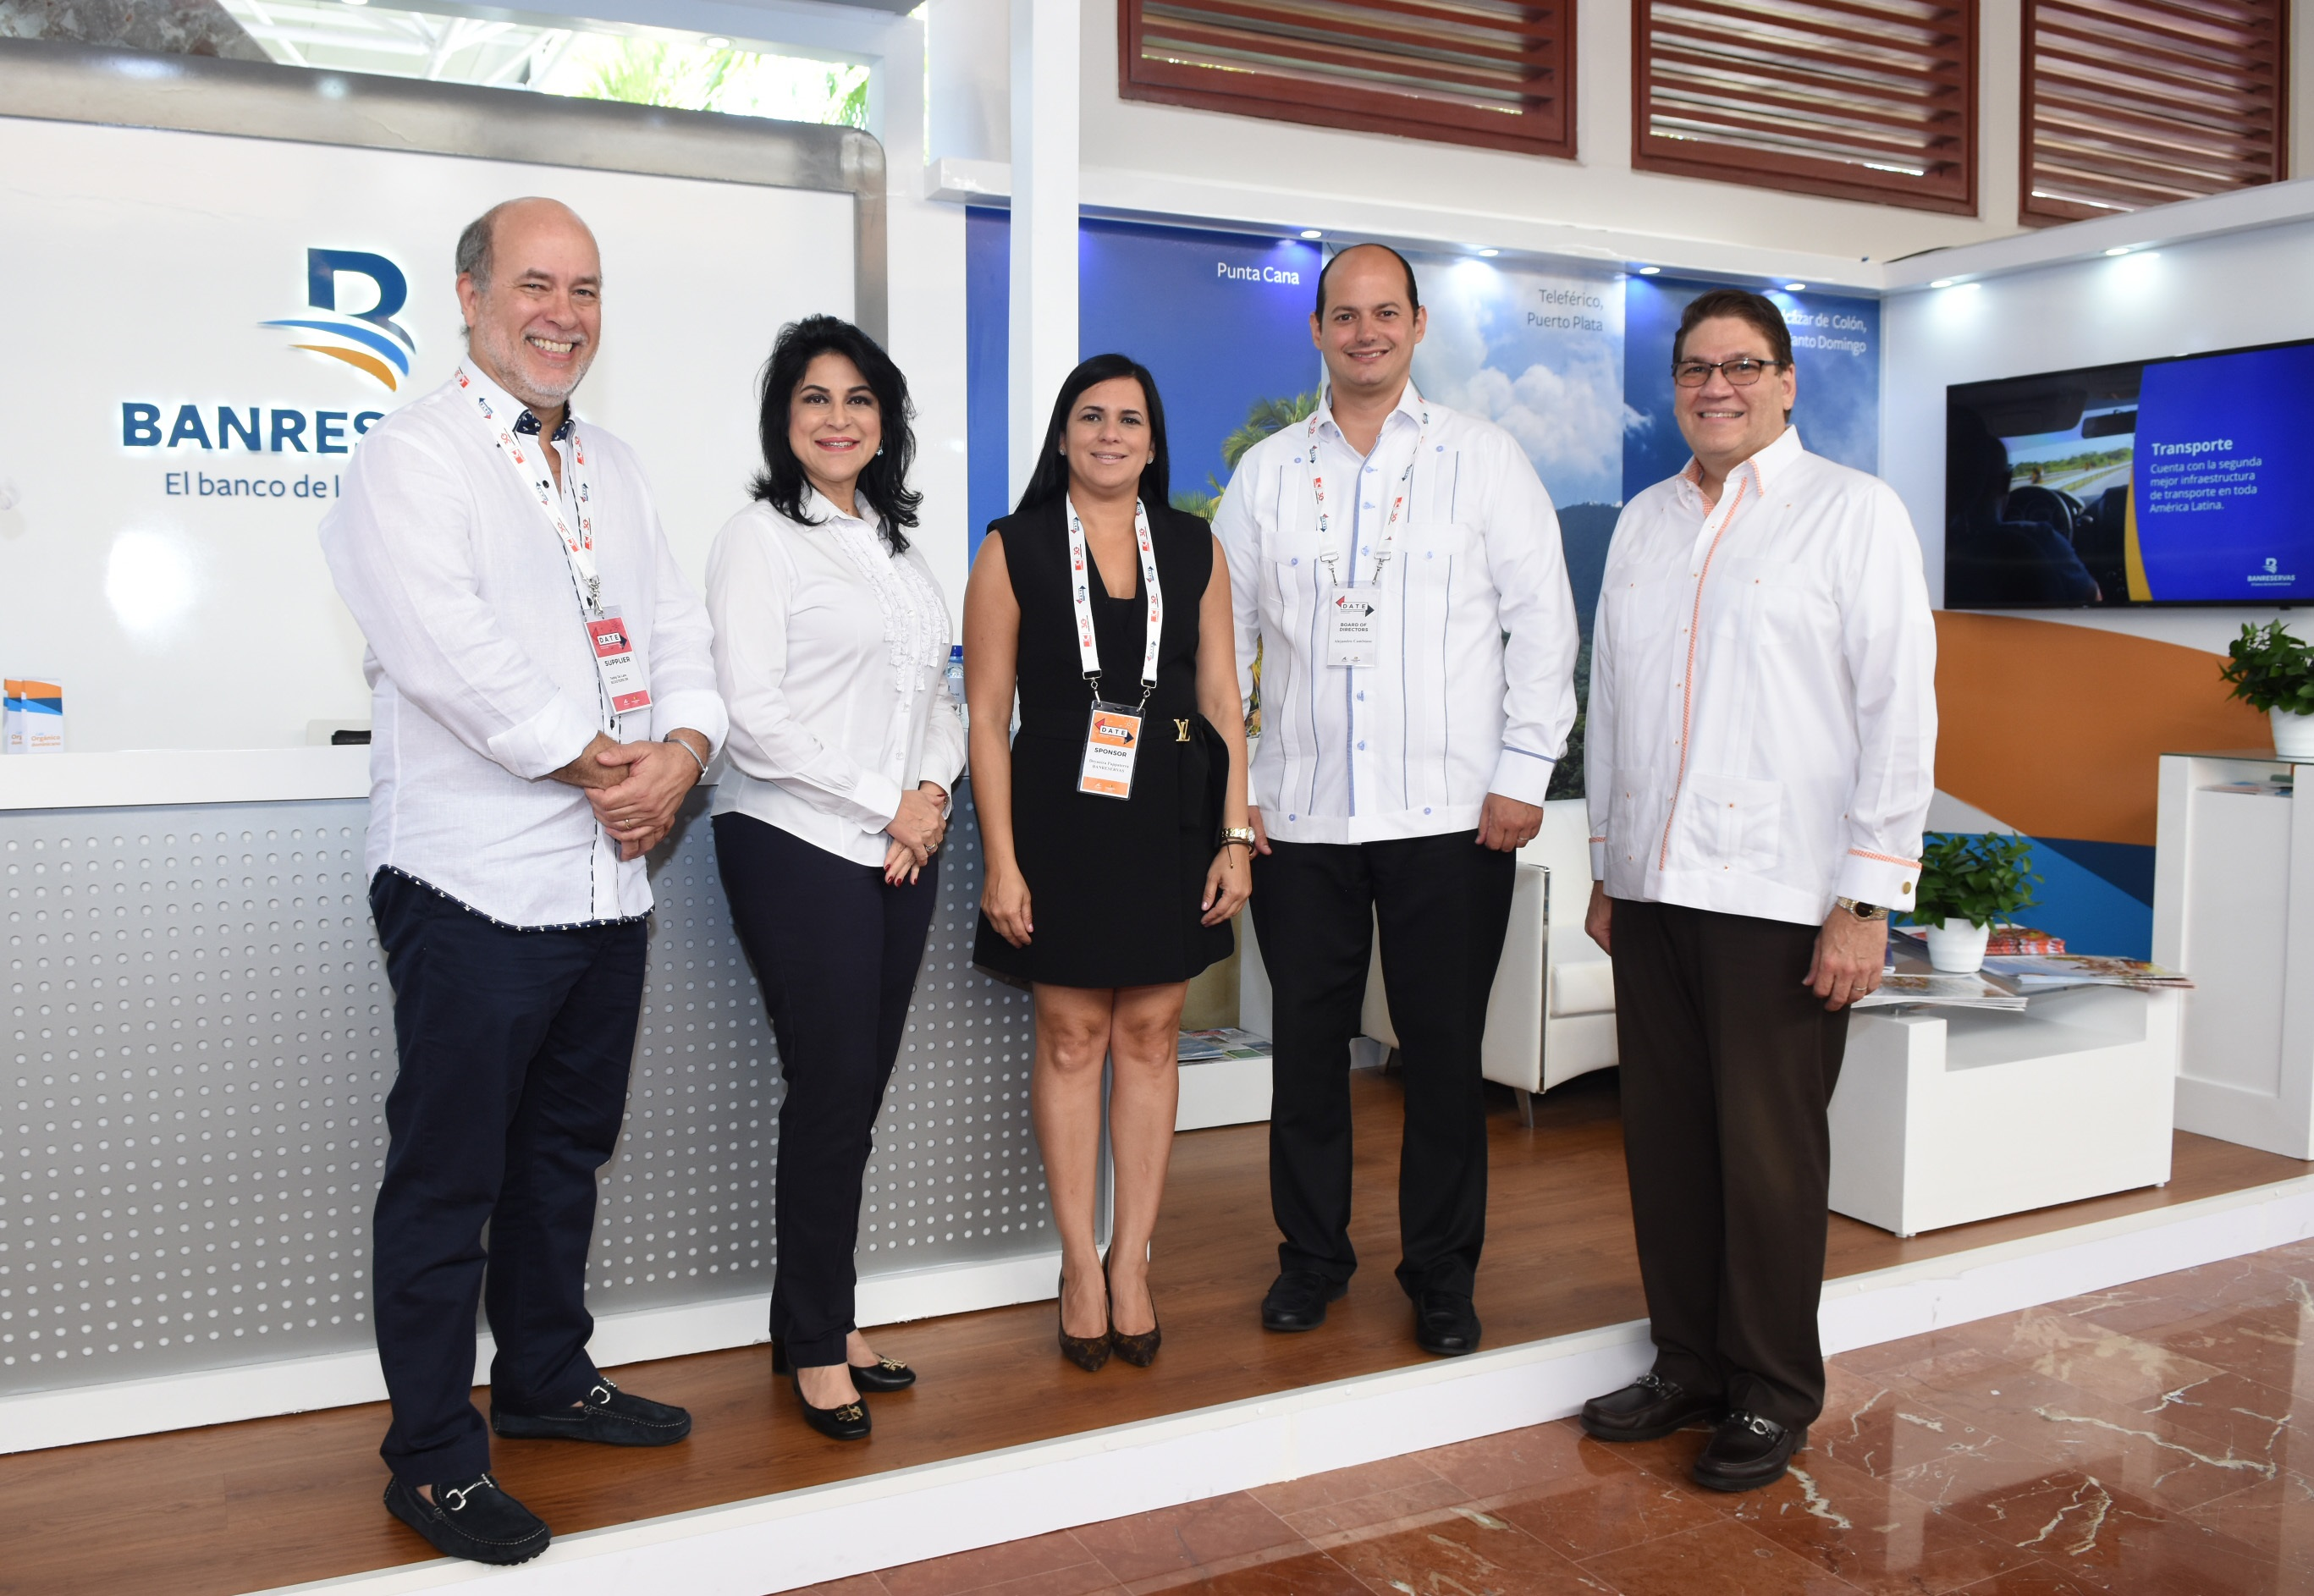 Banreservas participa en Date con portafolio para promover turismo